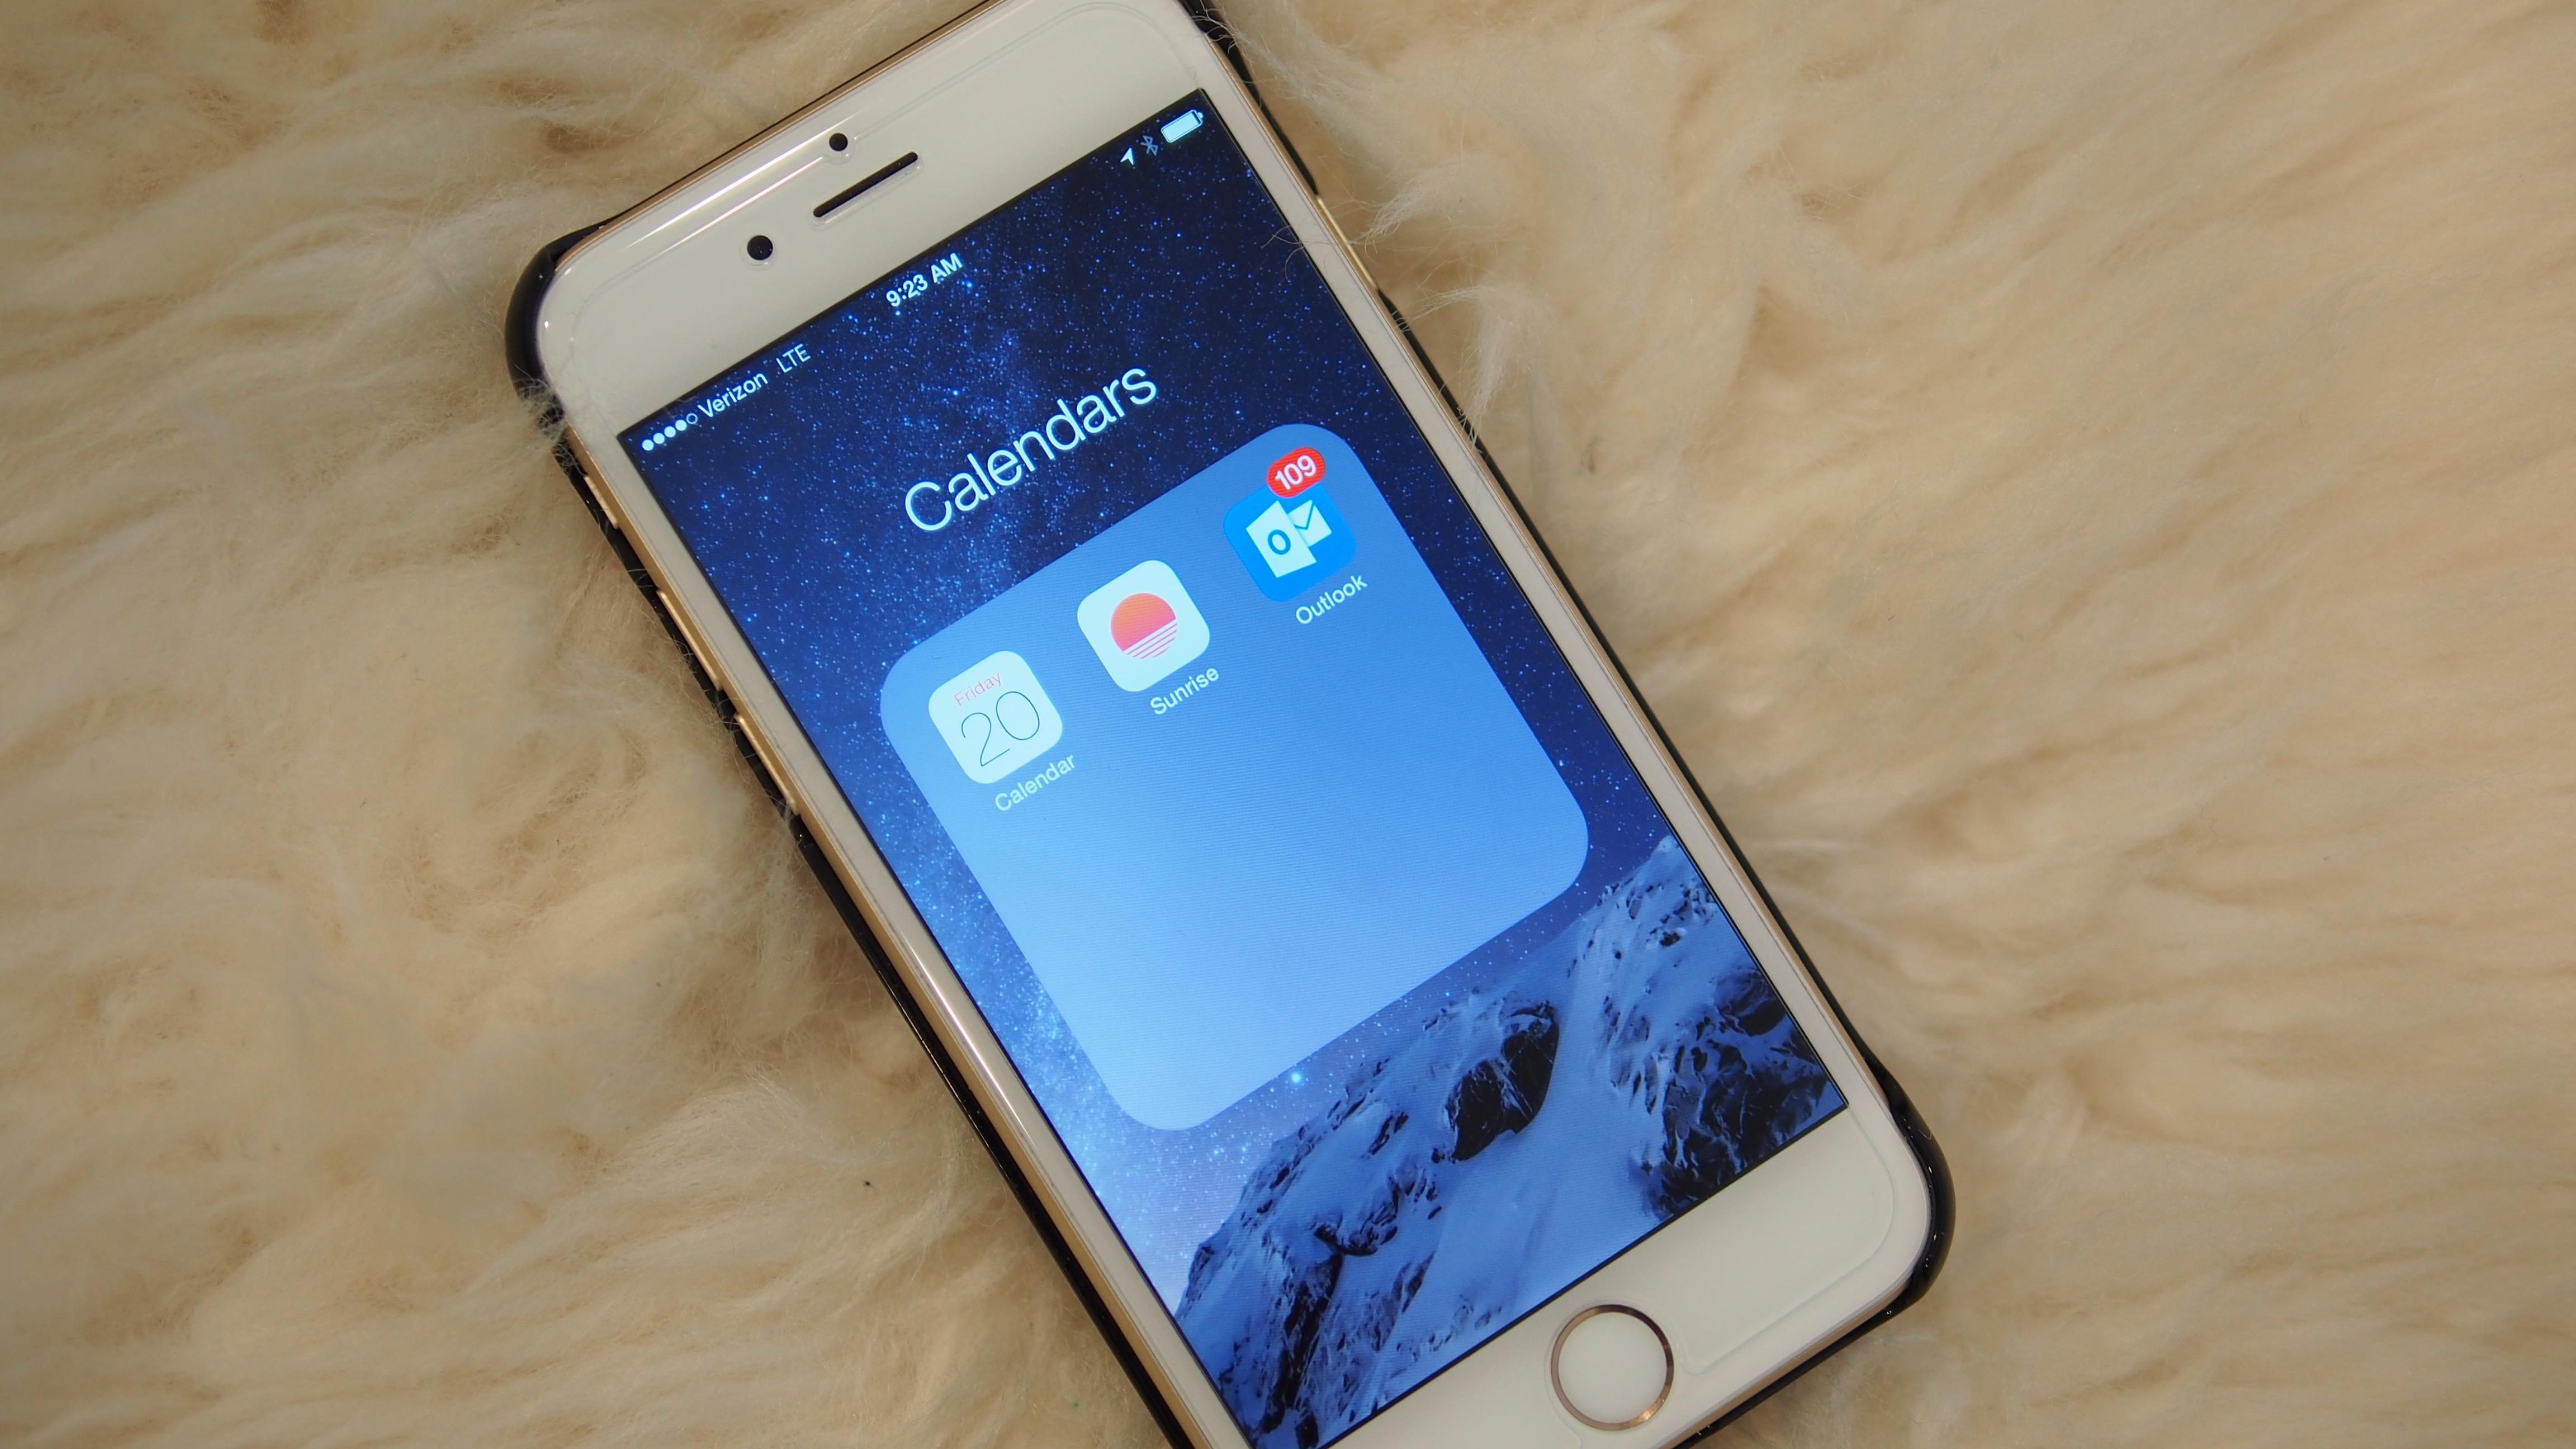 How to sync shared Google calendars with an iPhone | TechRadar